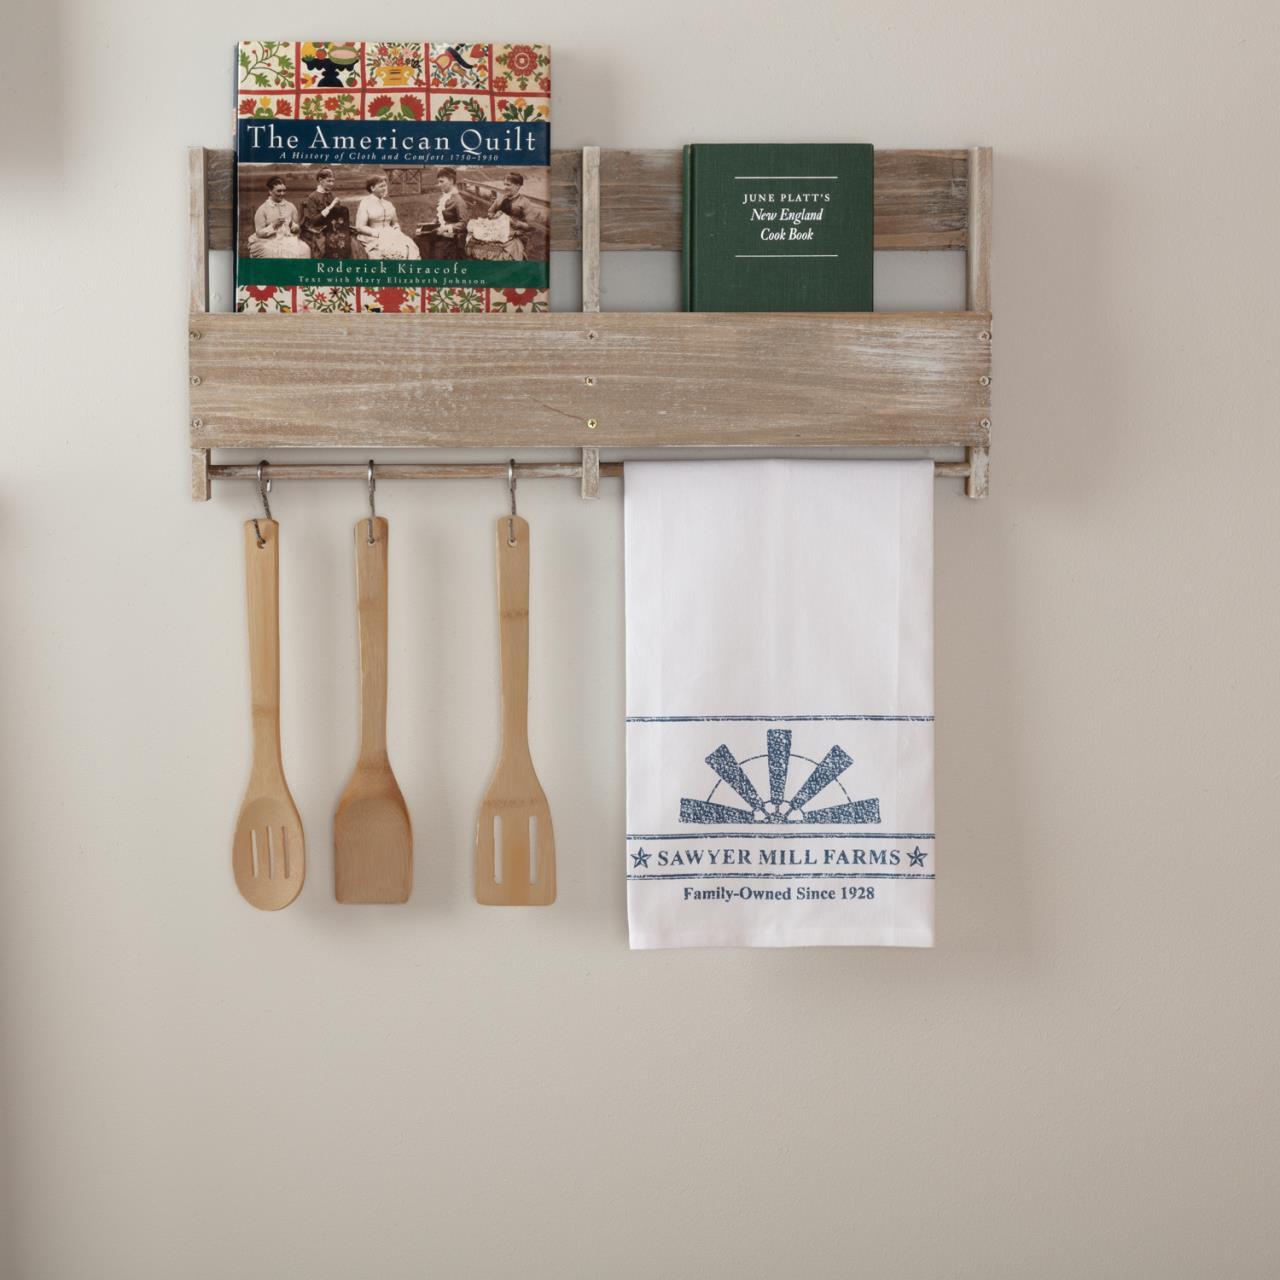 Sawyer Mill Blue Windmill Blade Muslin Bleached White Tea Towel - 840528180583